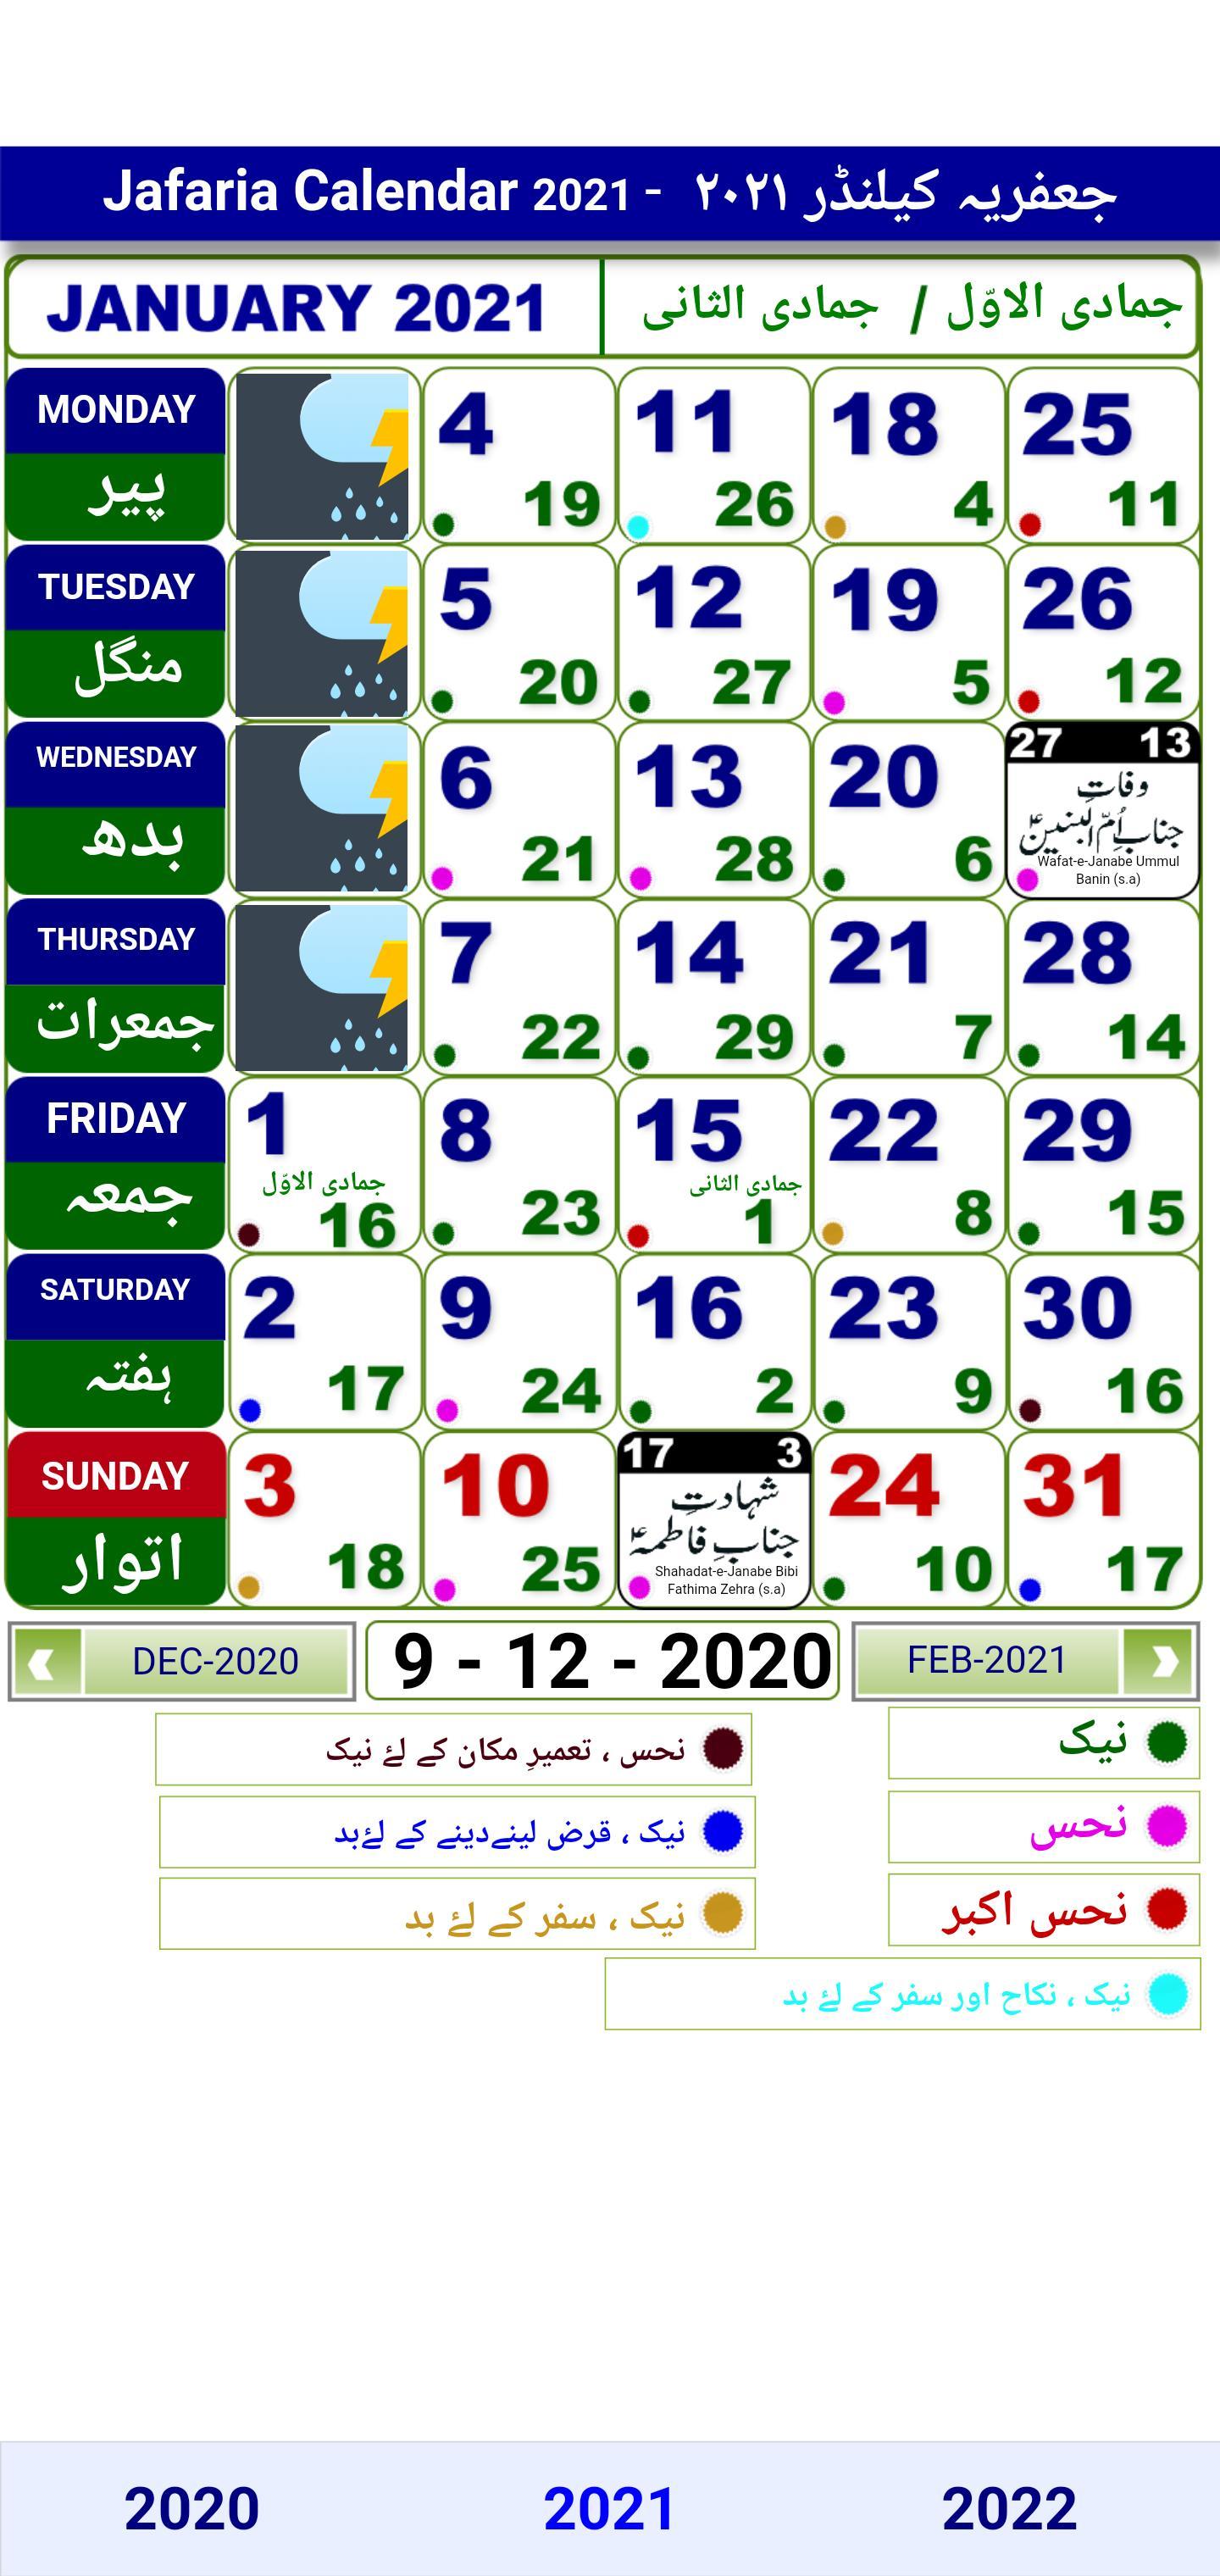 Ramadan Calendar 2022.Jafaria Shia Calendar 2021 2022 For Android Apk Download